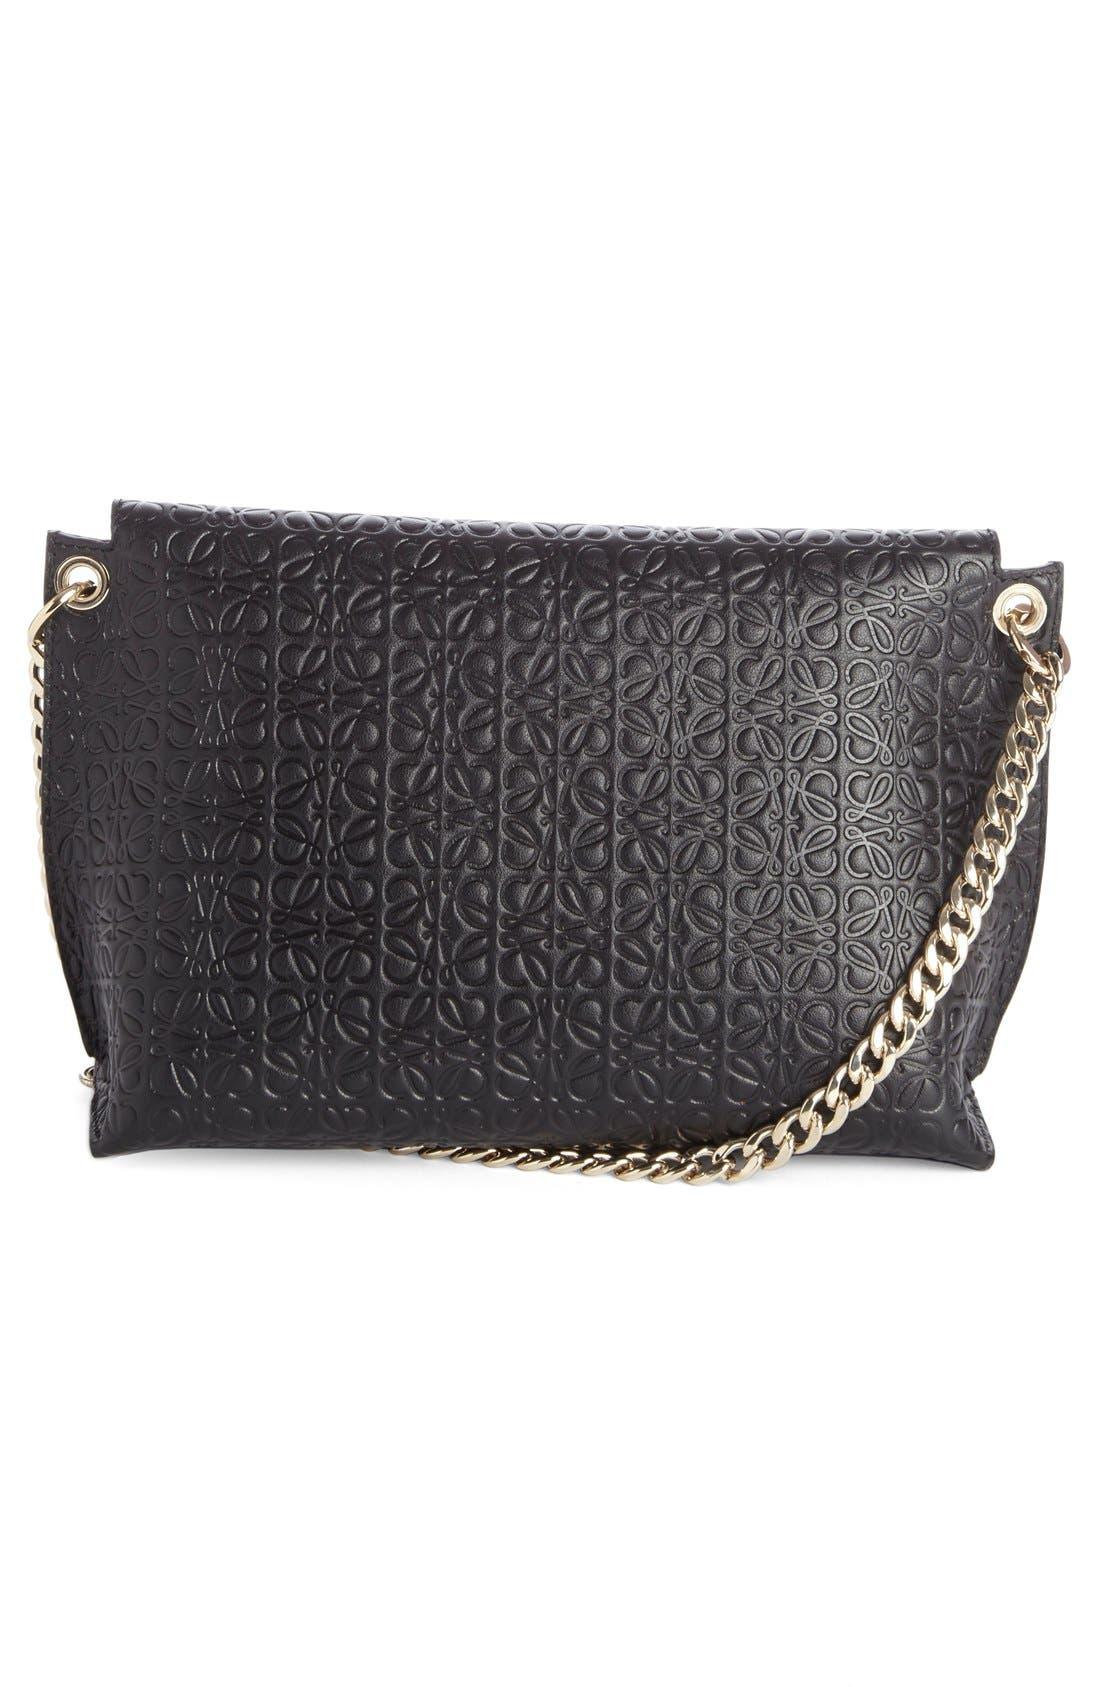 'Avenue' Embossed Calfskin Leather Crossbody Bag,                             Alternate thumbnail 2, color,                             BLACK